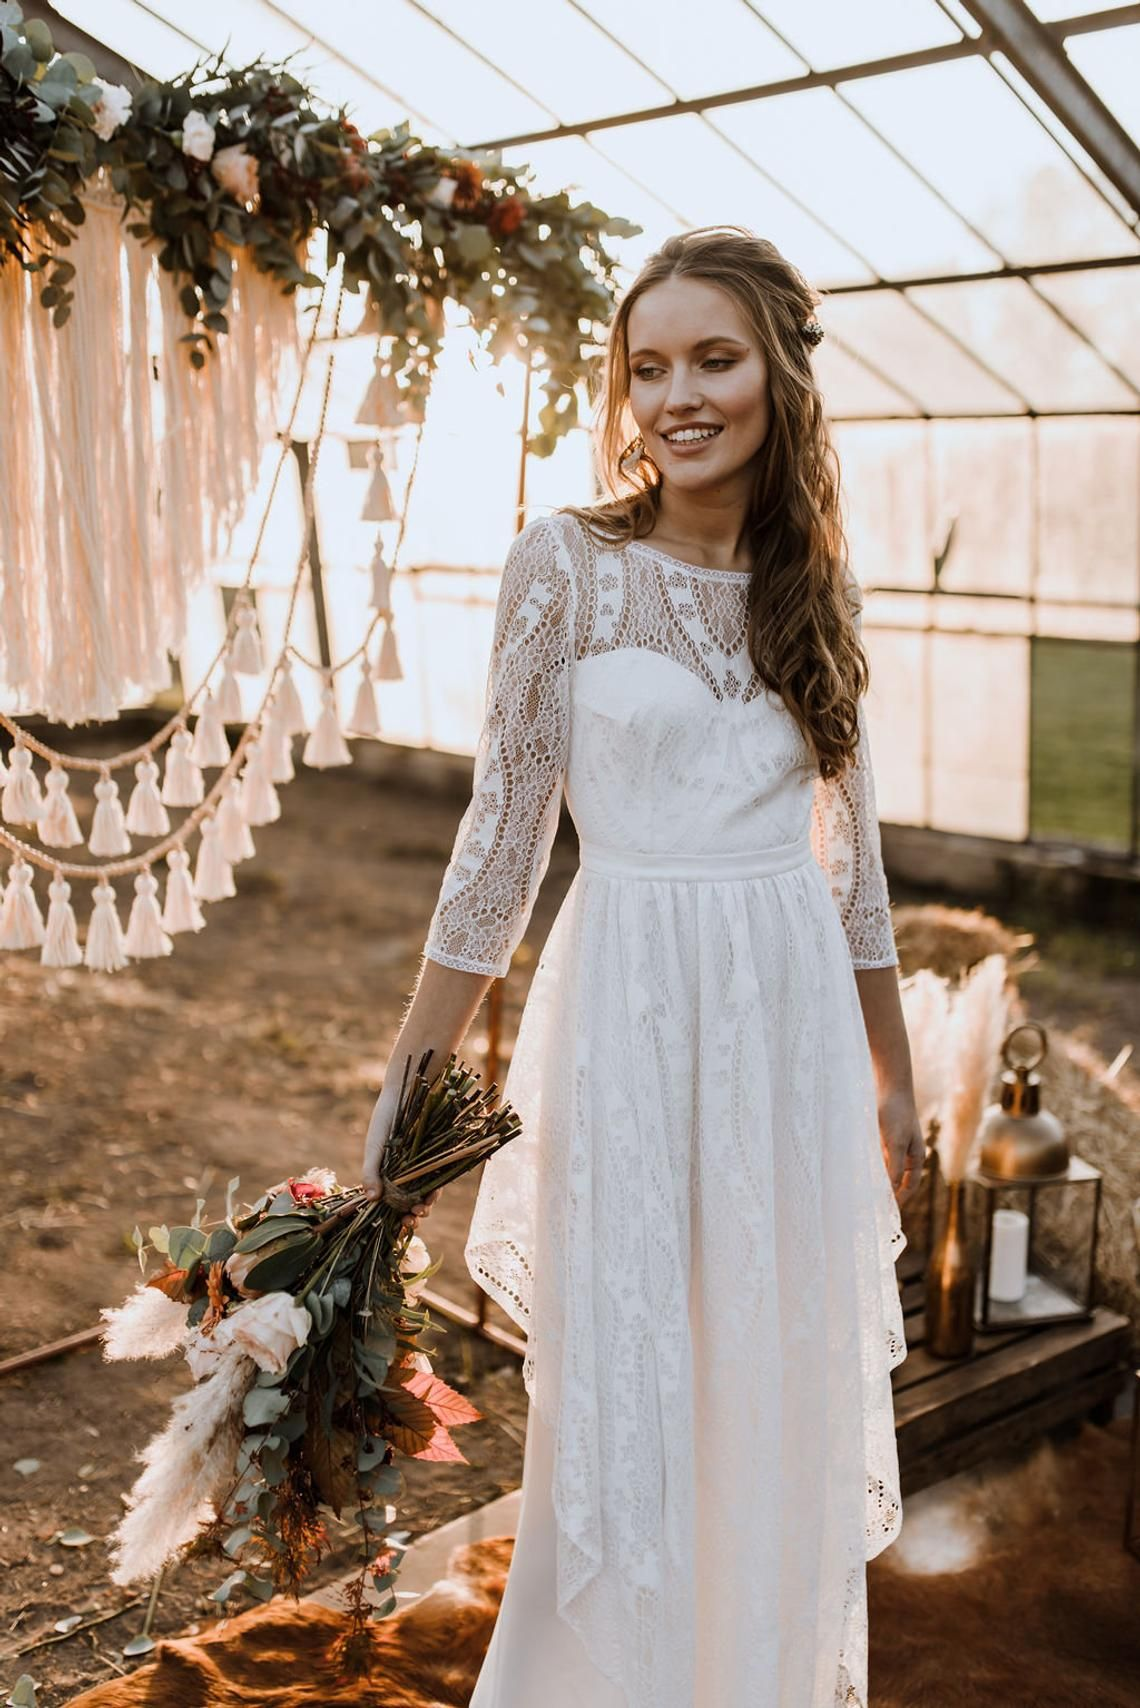 14+ Spanish style wedding dresses for cheap ideas